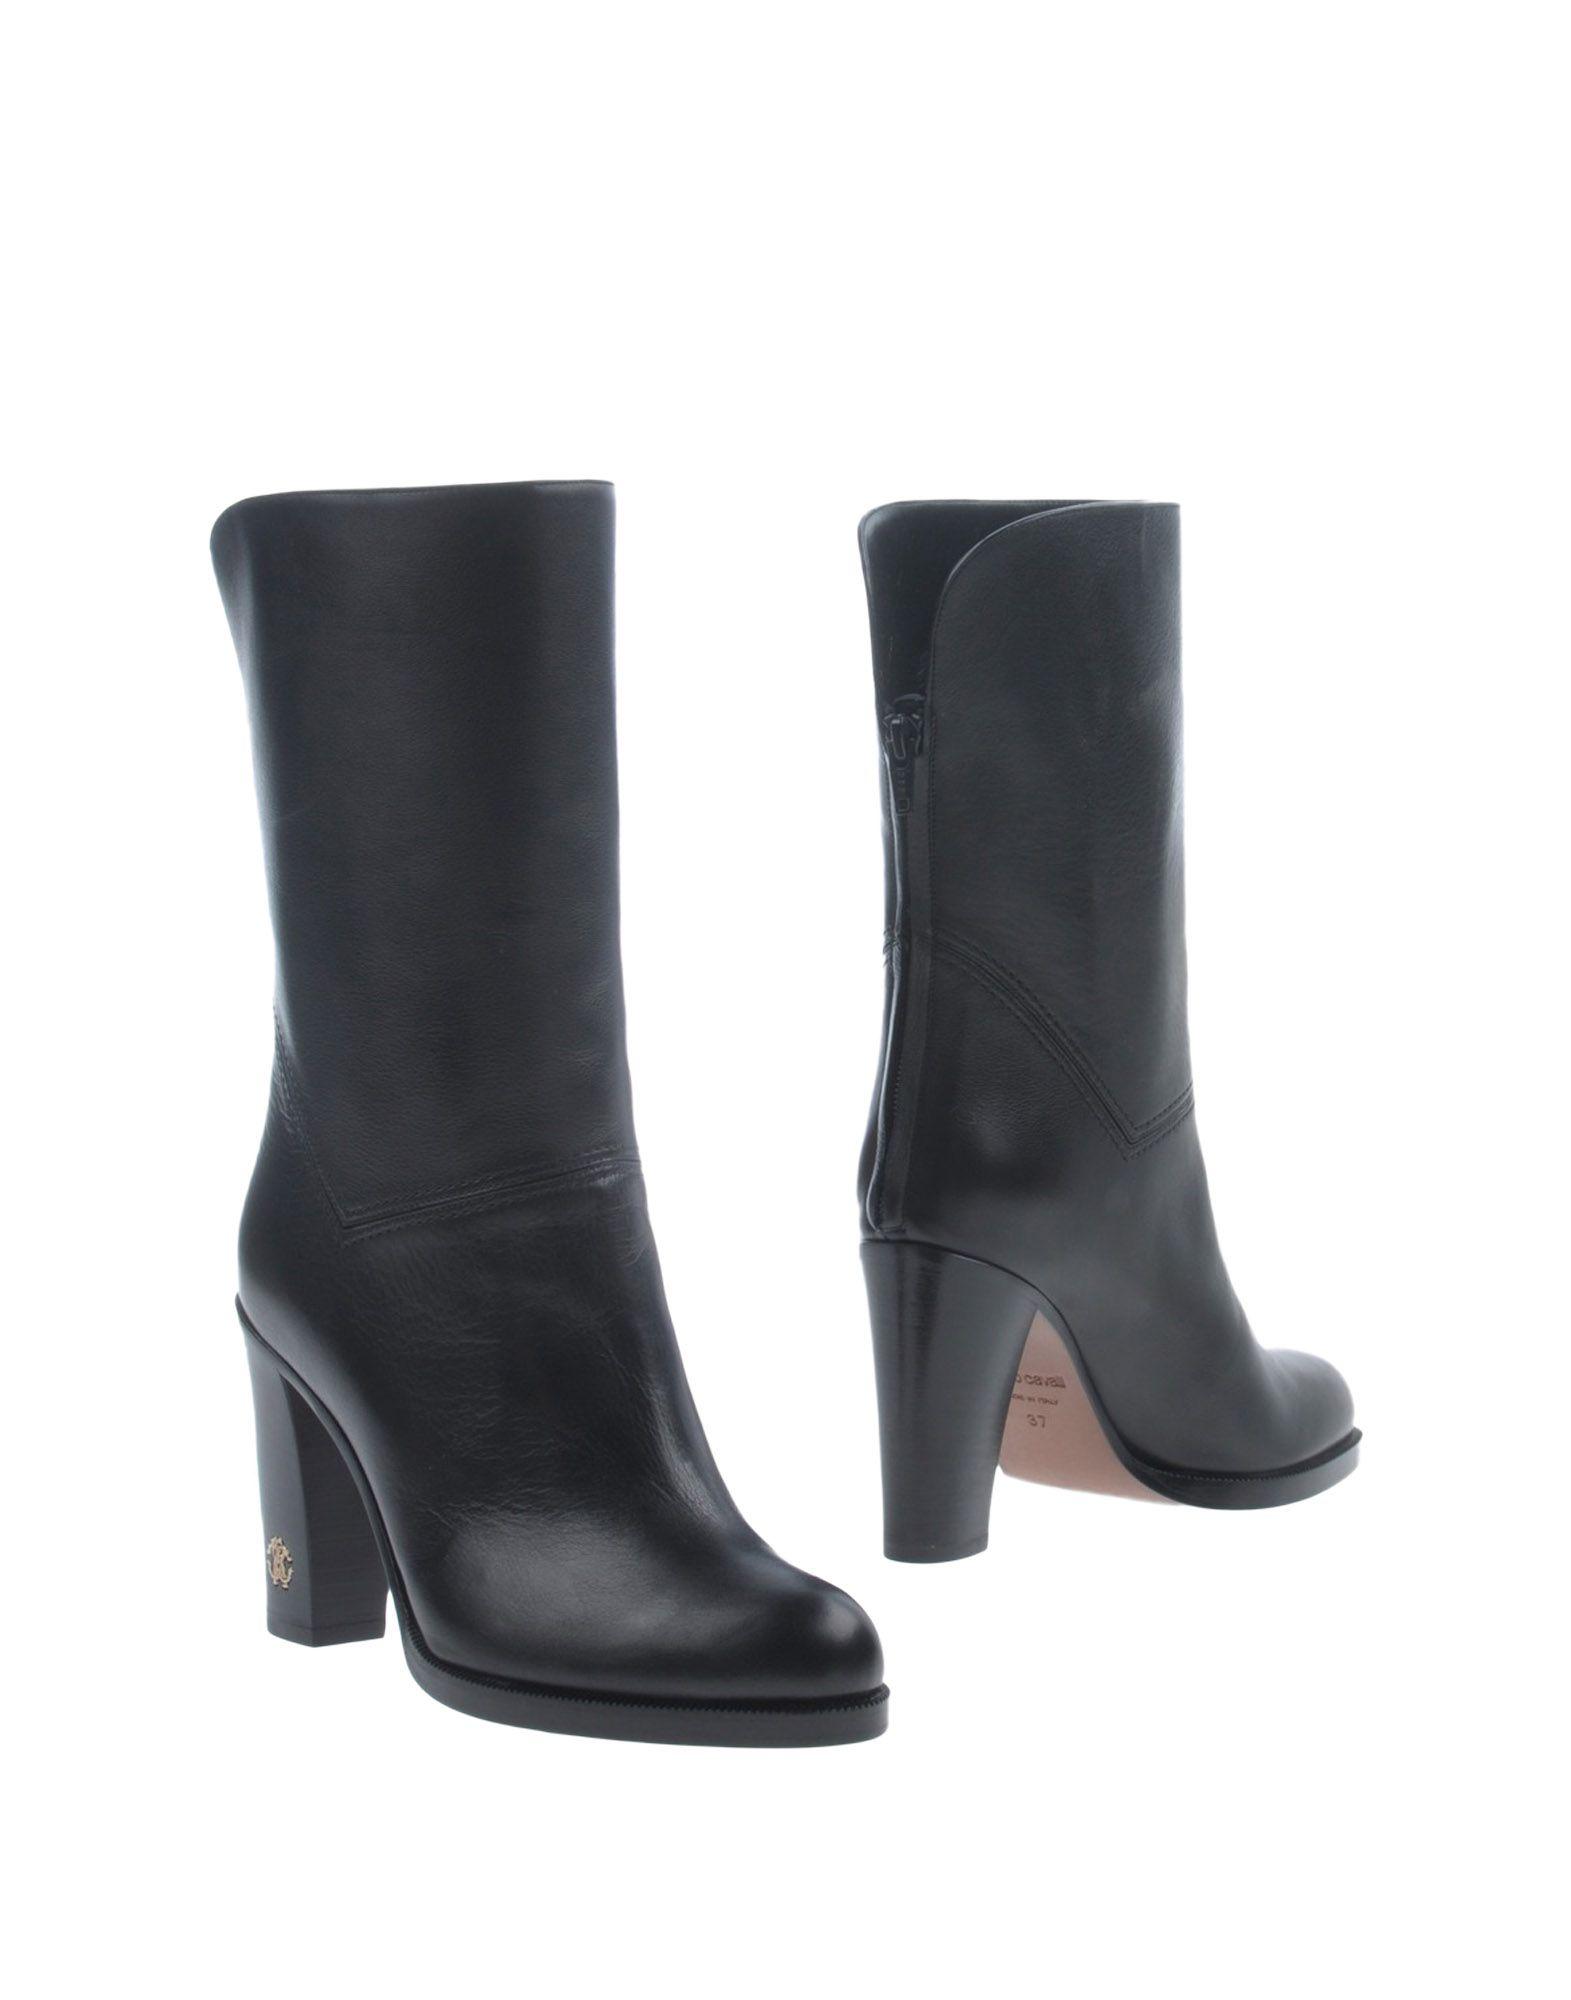 ROBERTO CAVALLI Полусапоги и высокие ботинки just cavalli полусапоги и высокие ботинки